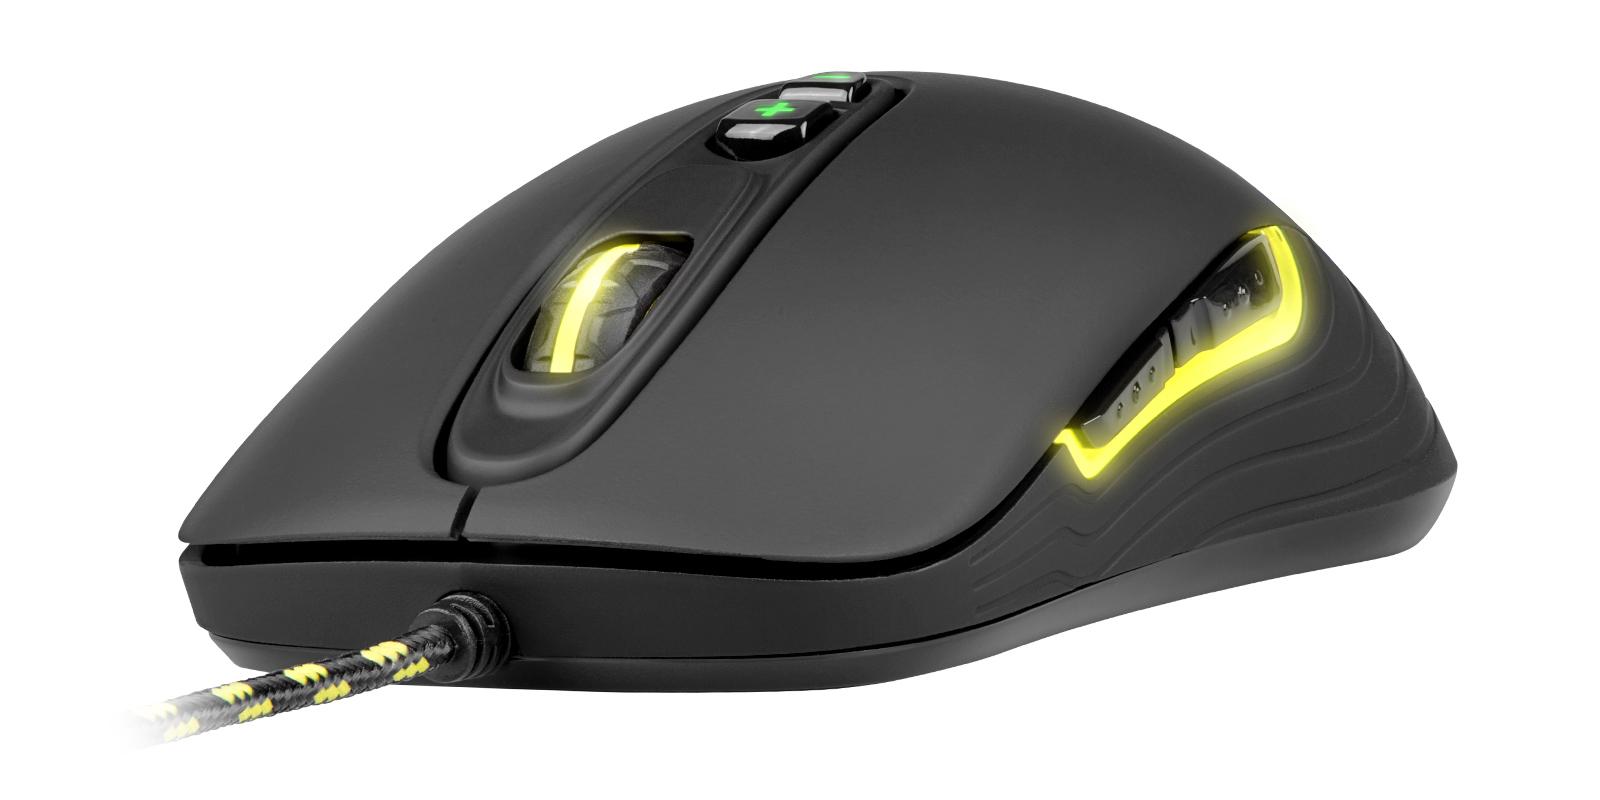 Xtrfy M2 USB Optical 4000DPI Right-hand Black mice